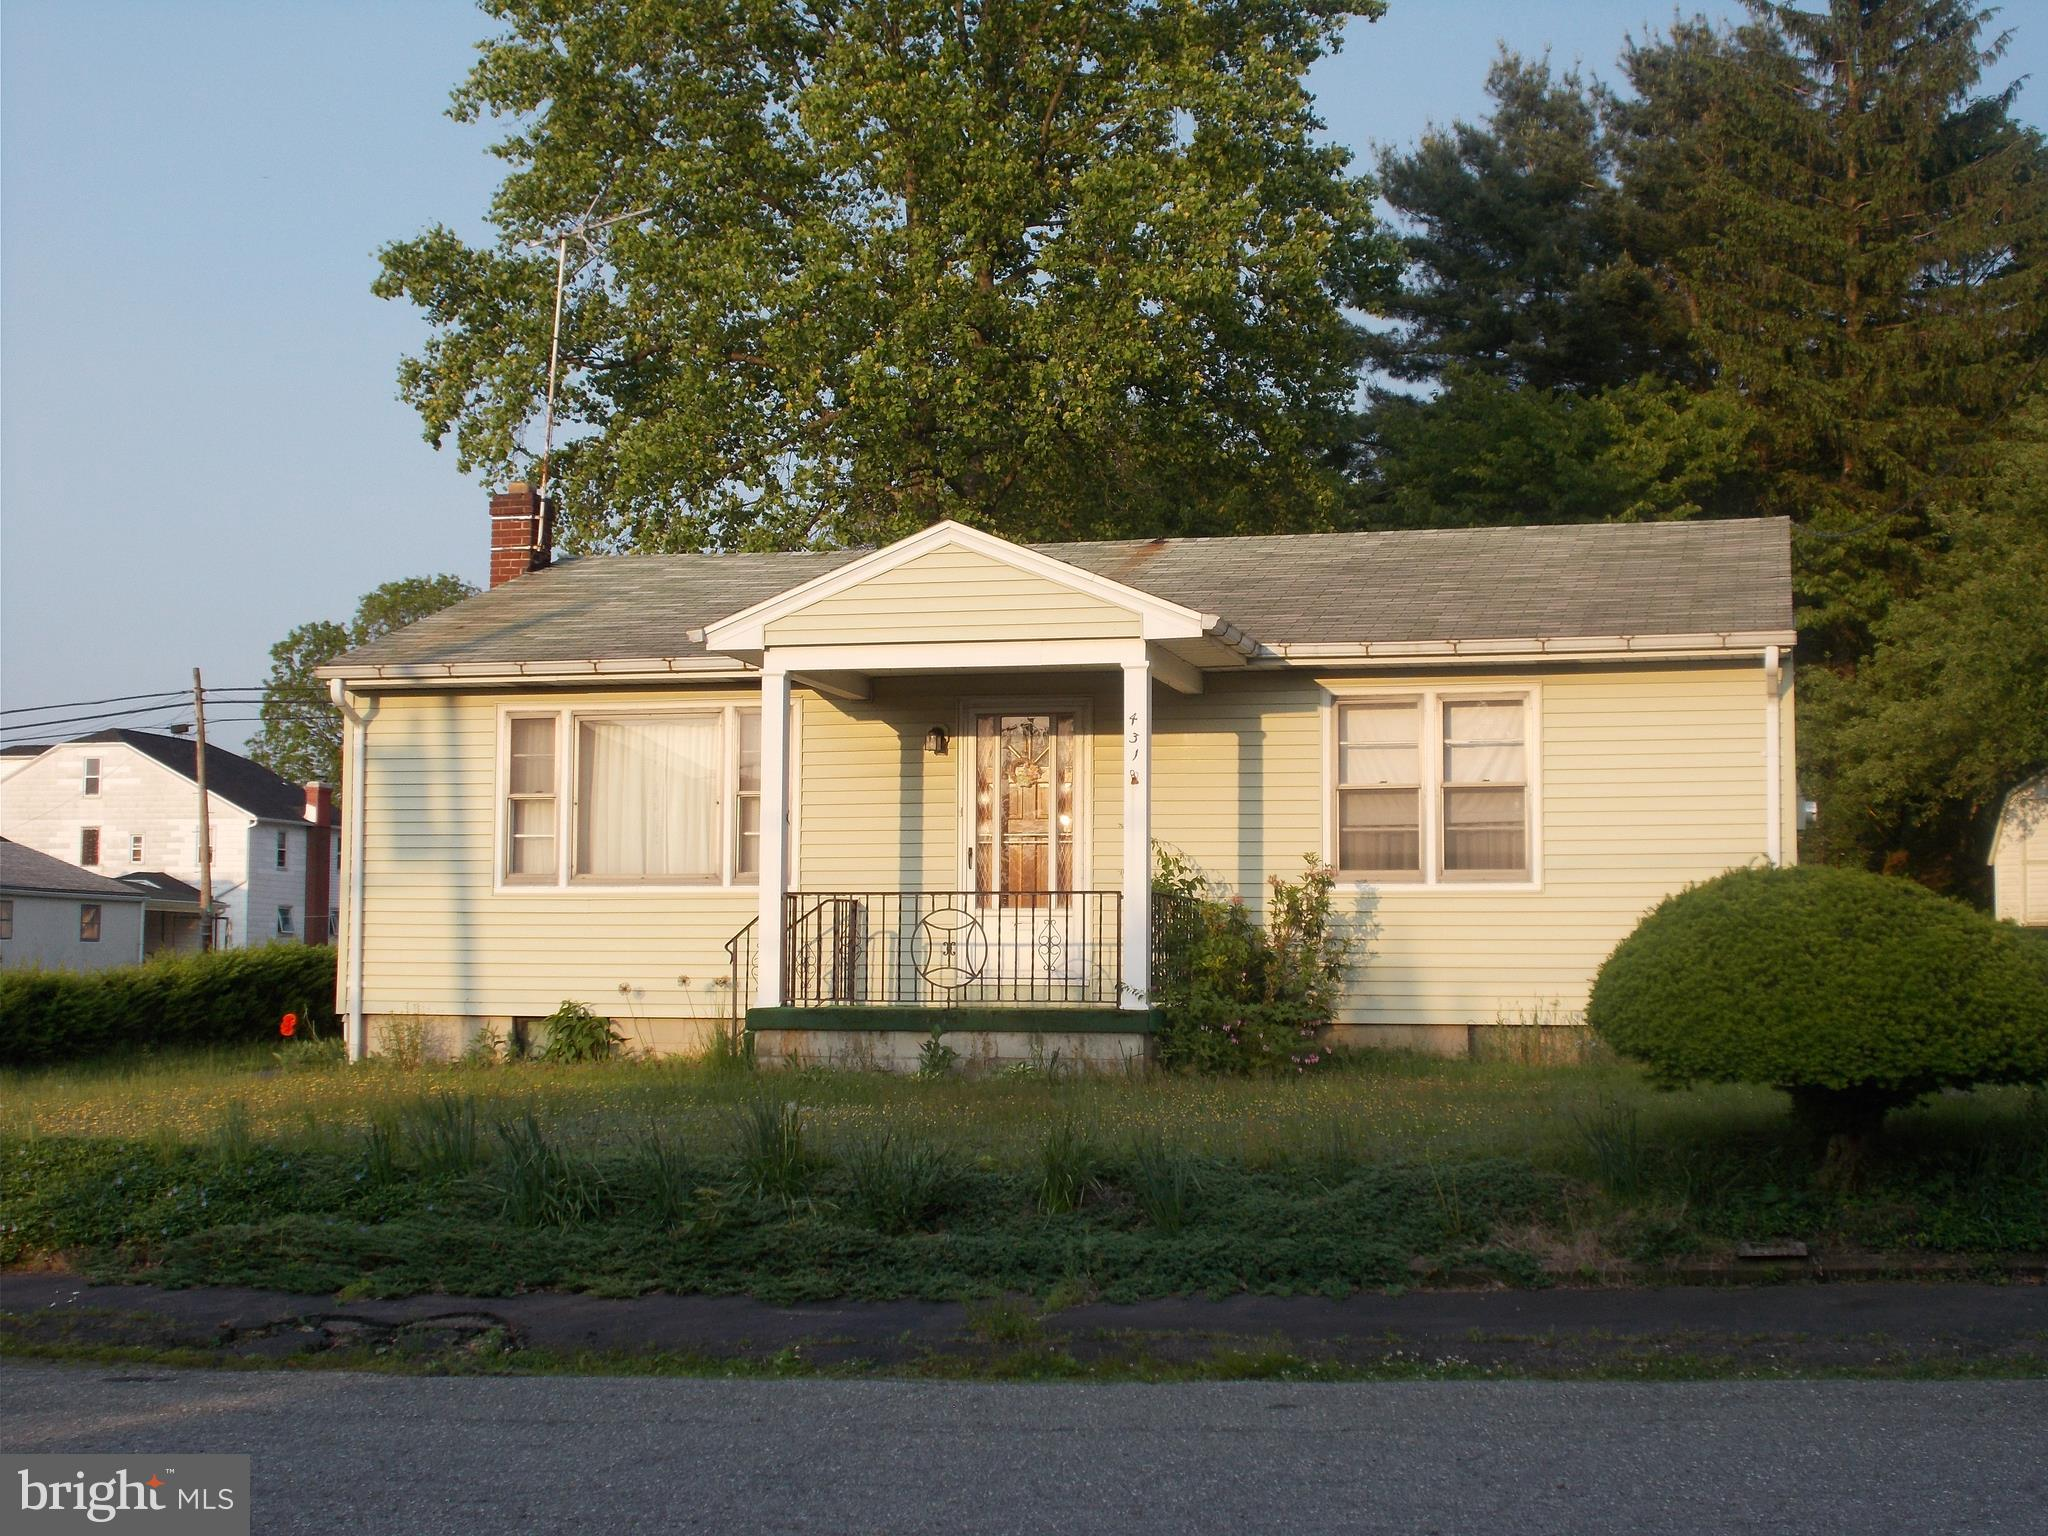 431 S CLEVELAND STREET, MCADOO, PA 18237